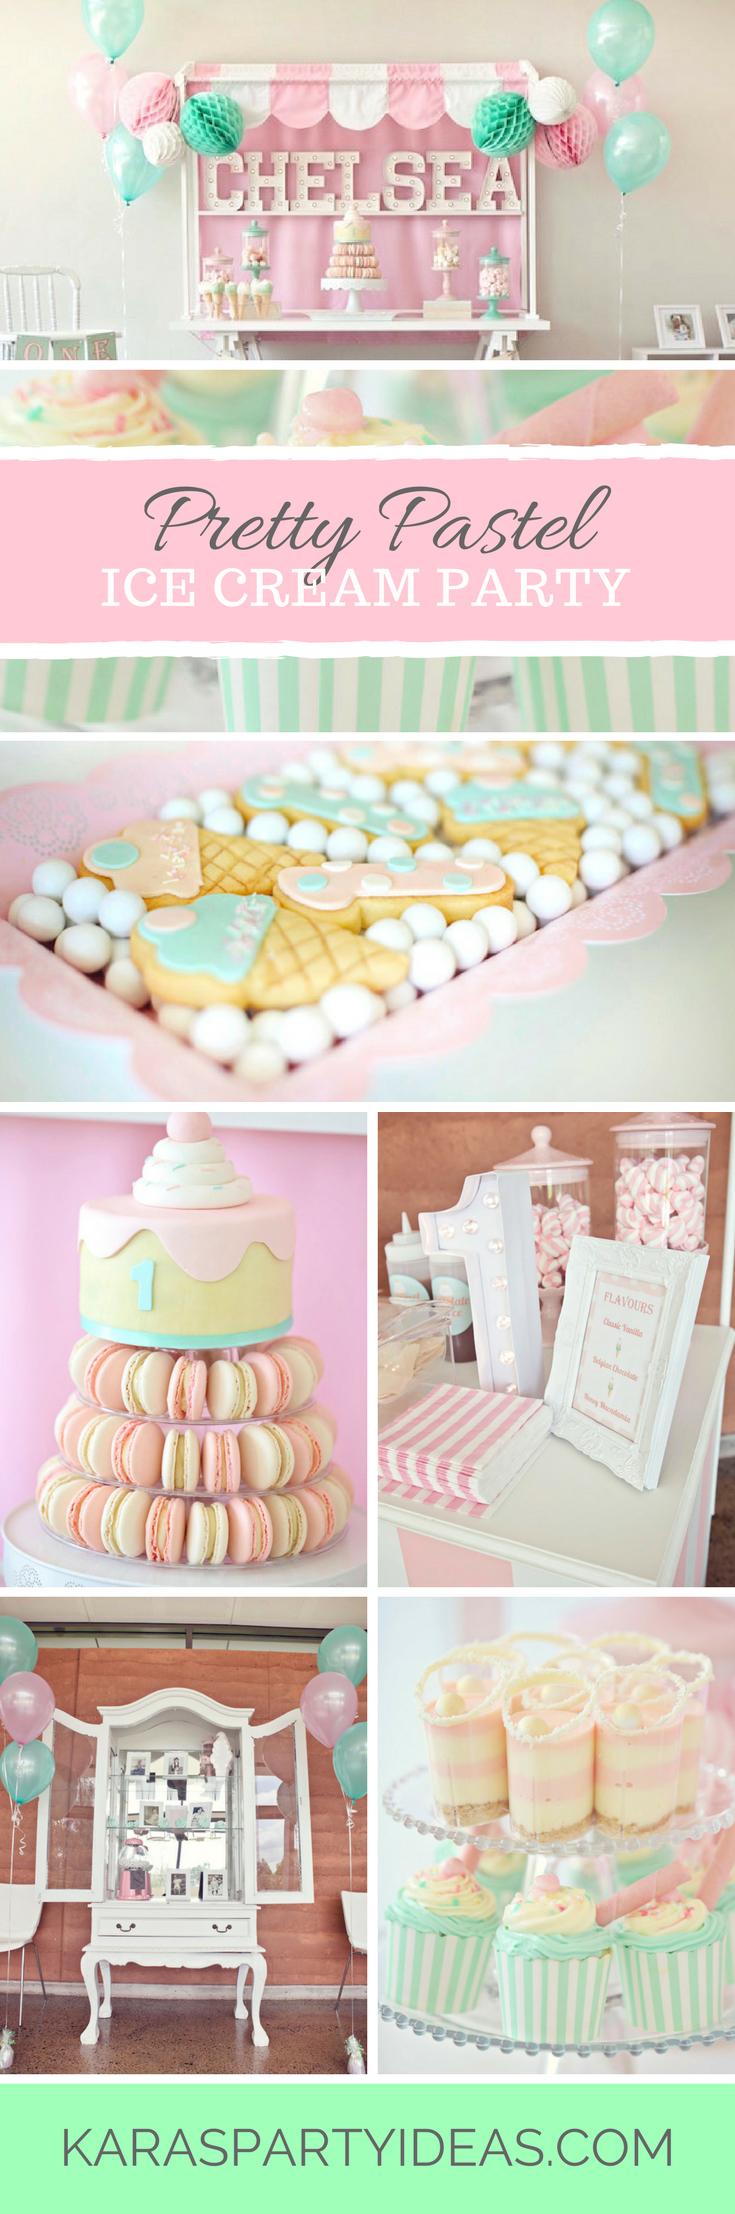 Pretty Pastel Ice Cream Party via Kara's Party Ideas - KarasPartyIdeas.com